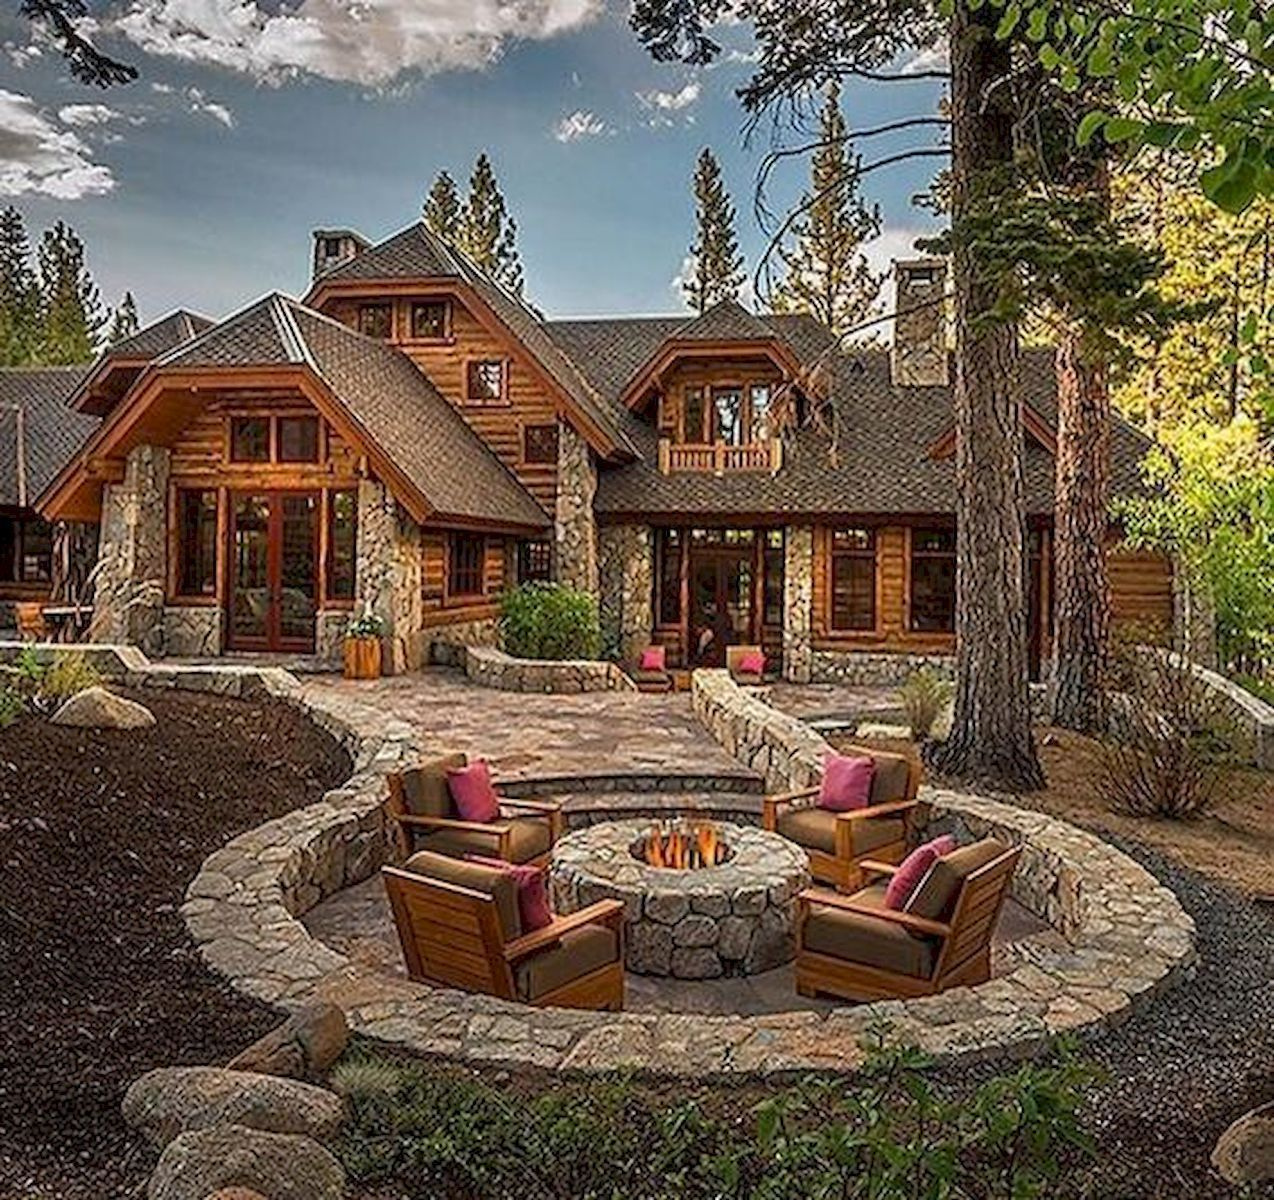 Home Design Ideas Outside: 75 Best Log Cabin Homes Plans Design Ideas (10